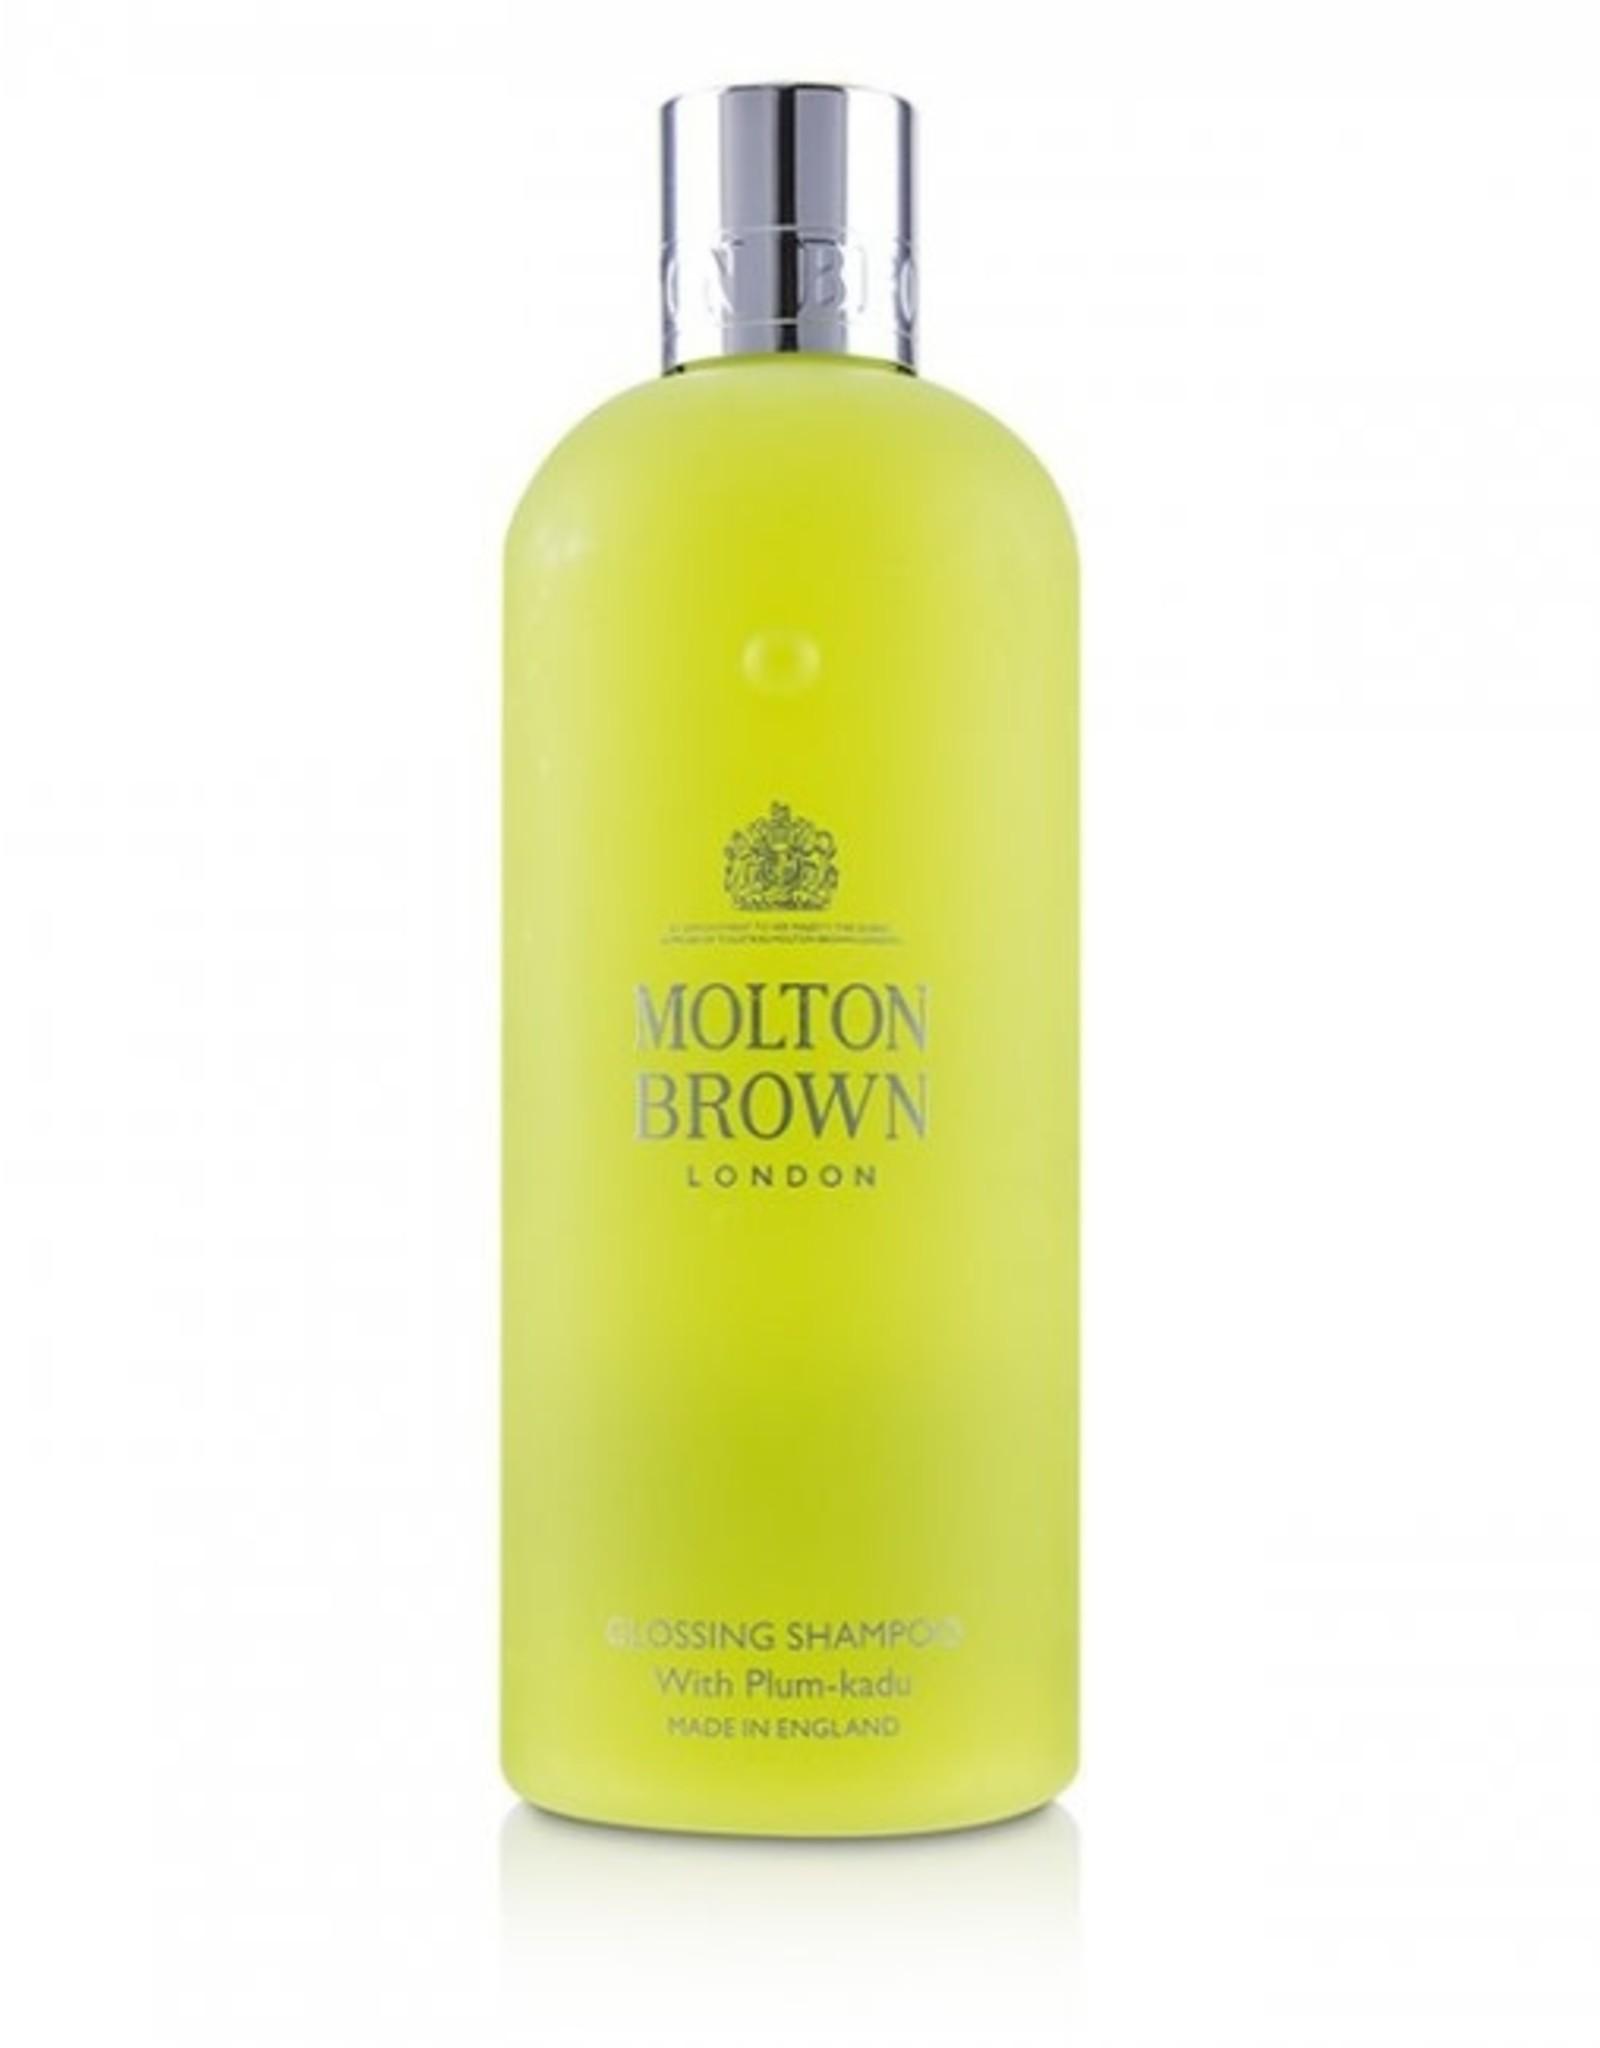 Molton Brown Shine-boosting Shampoo with Plum-kadu